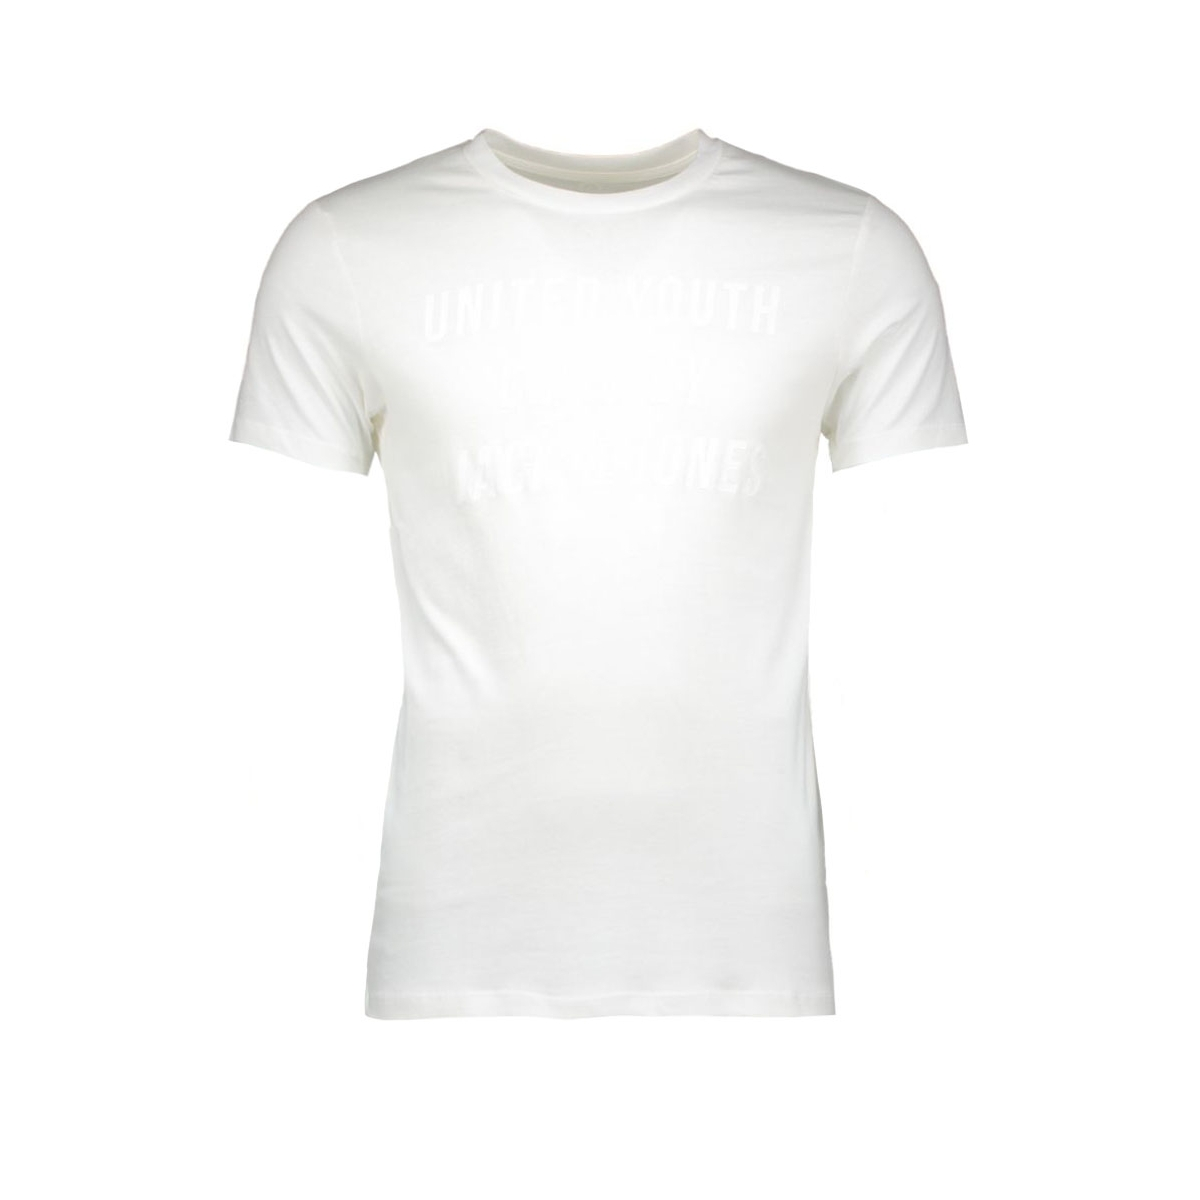 jcosharp tee ss crew neck 12108919 jack & jones t-shirt blanc de blanc